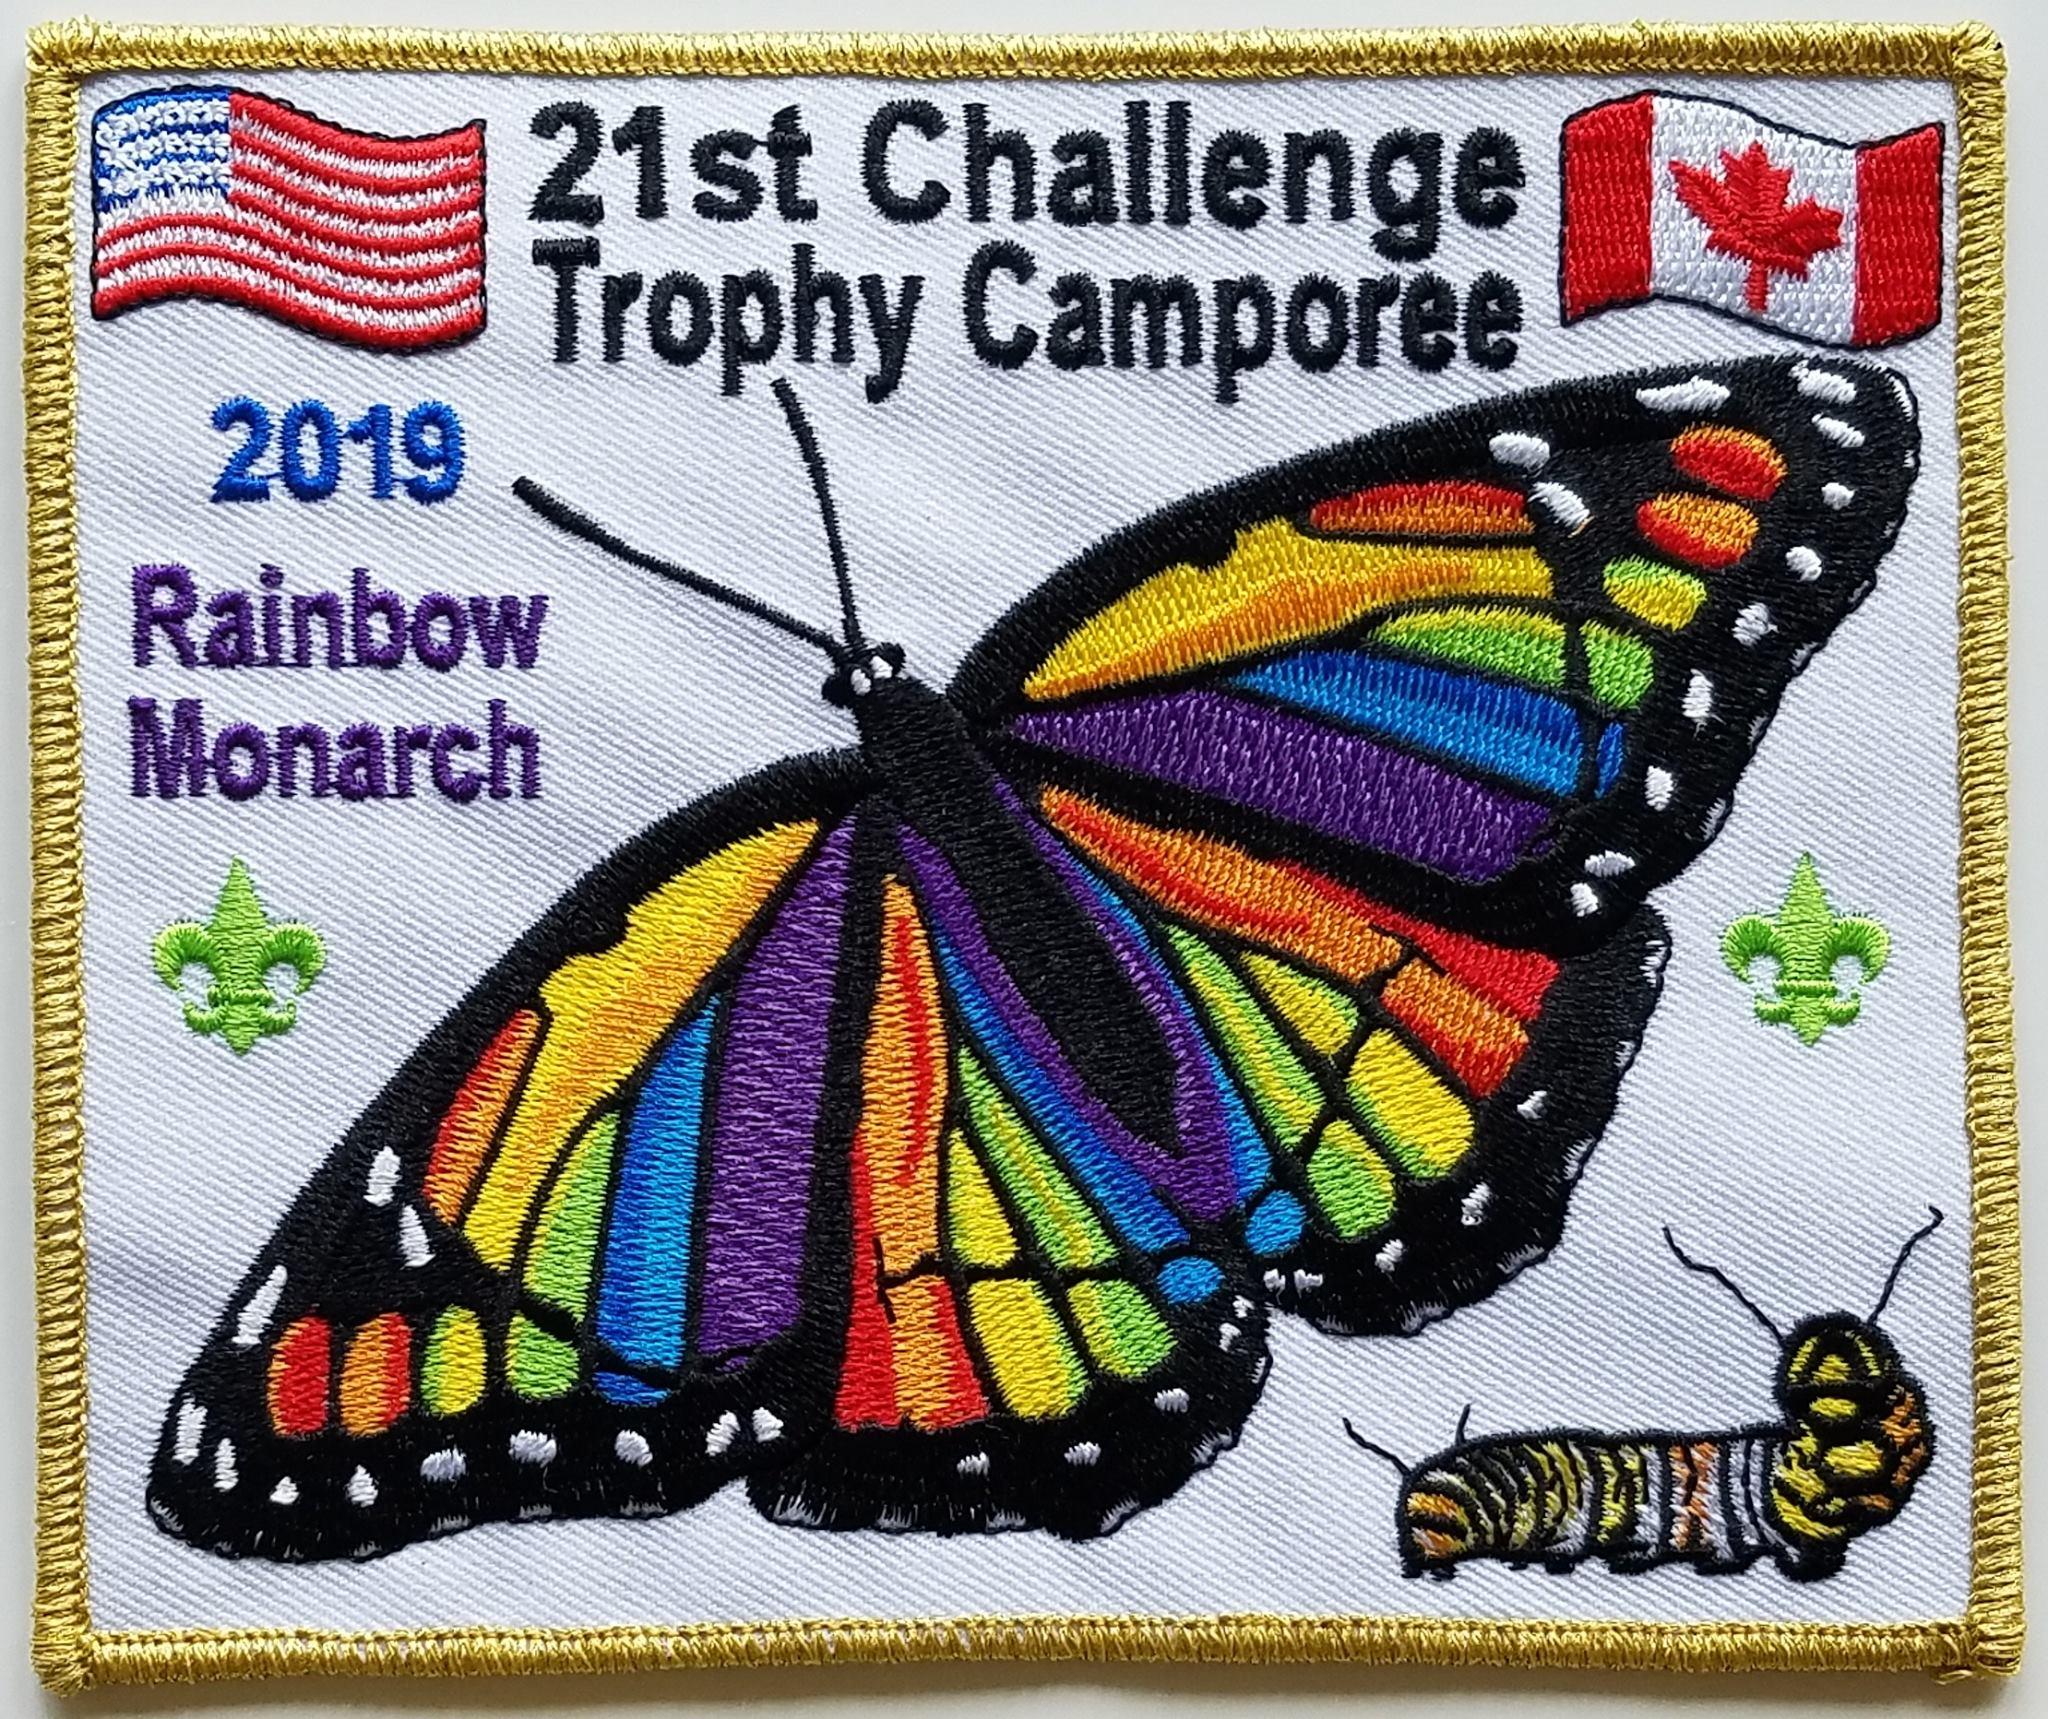 21st Challenge Trophy Camporee